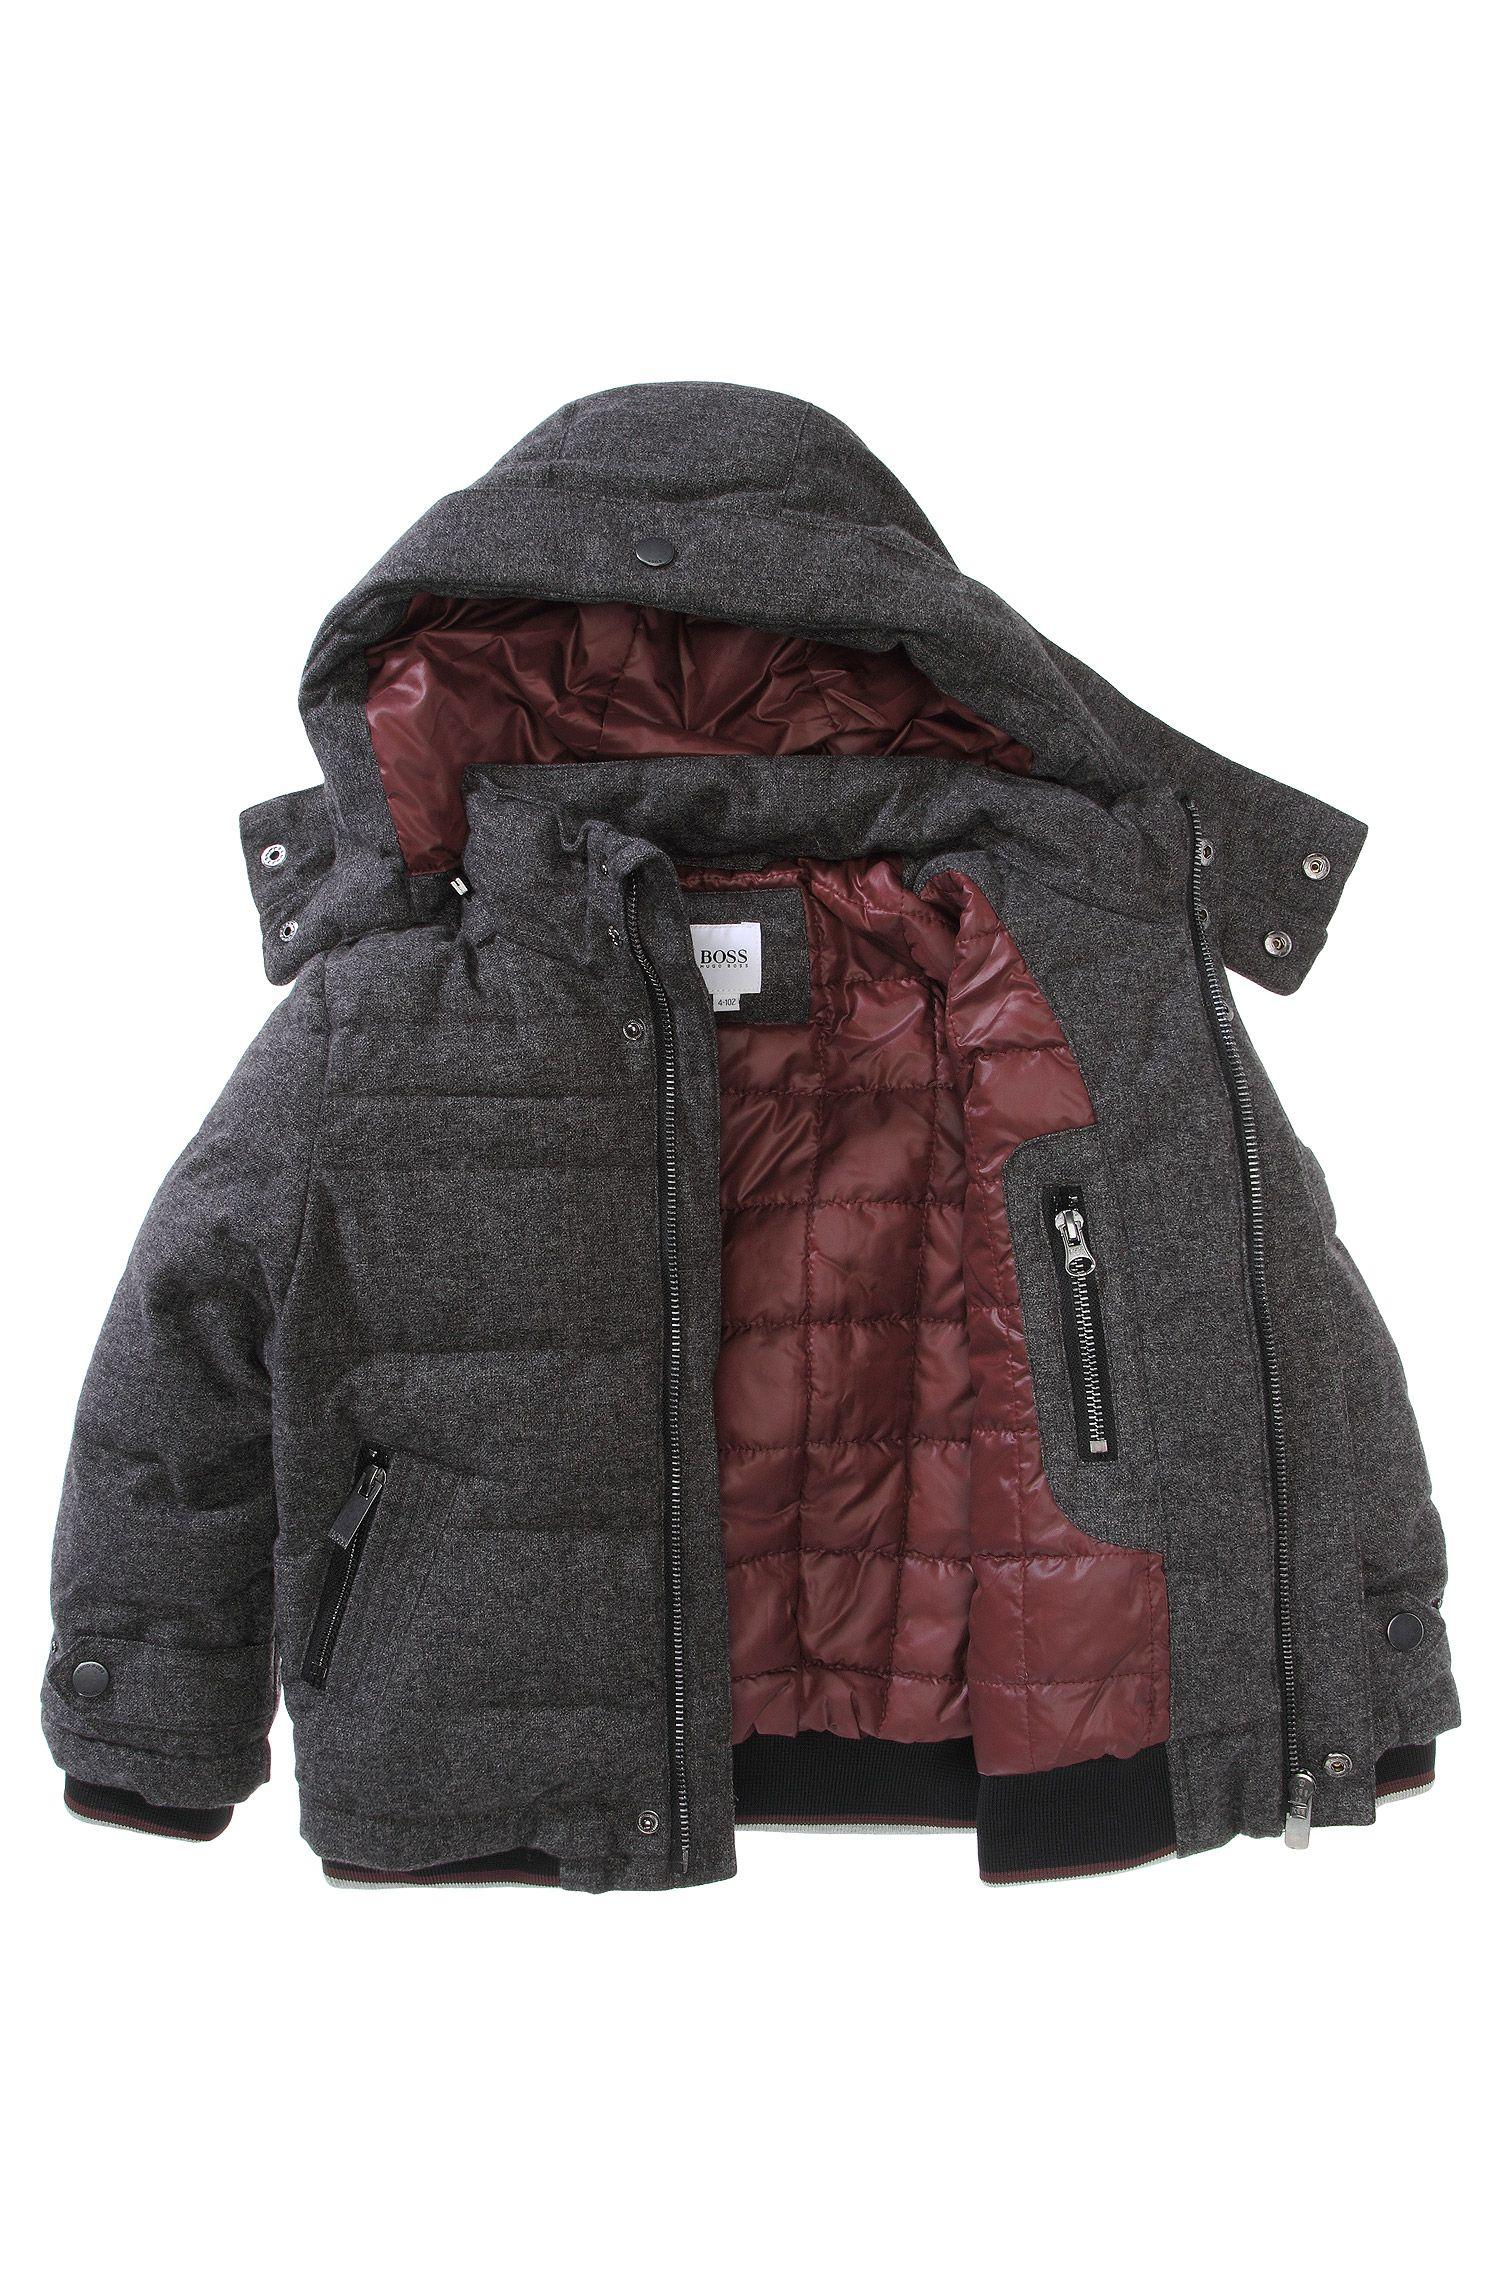 Kids Outdoor-Jacke mit Kapuze ´J26171/A80`